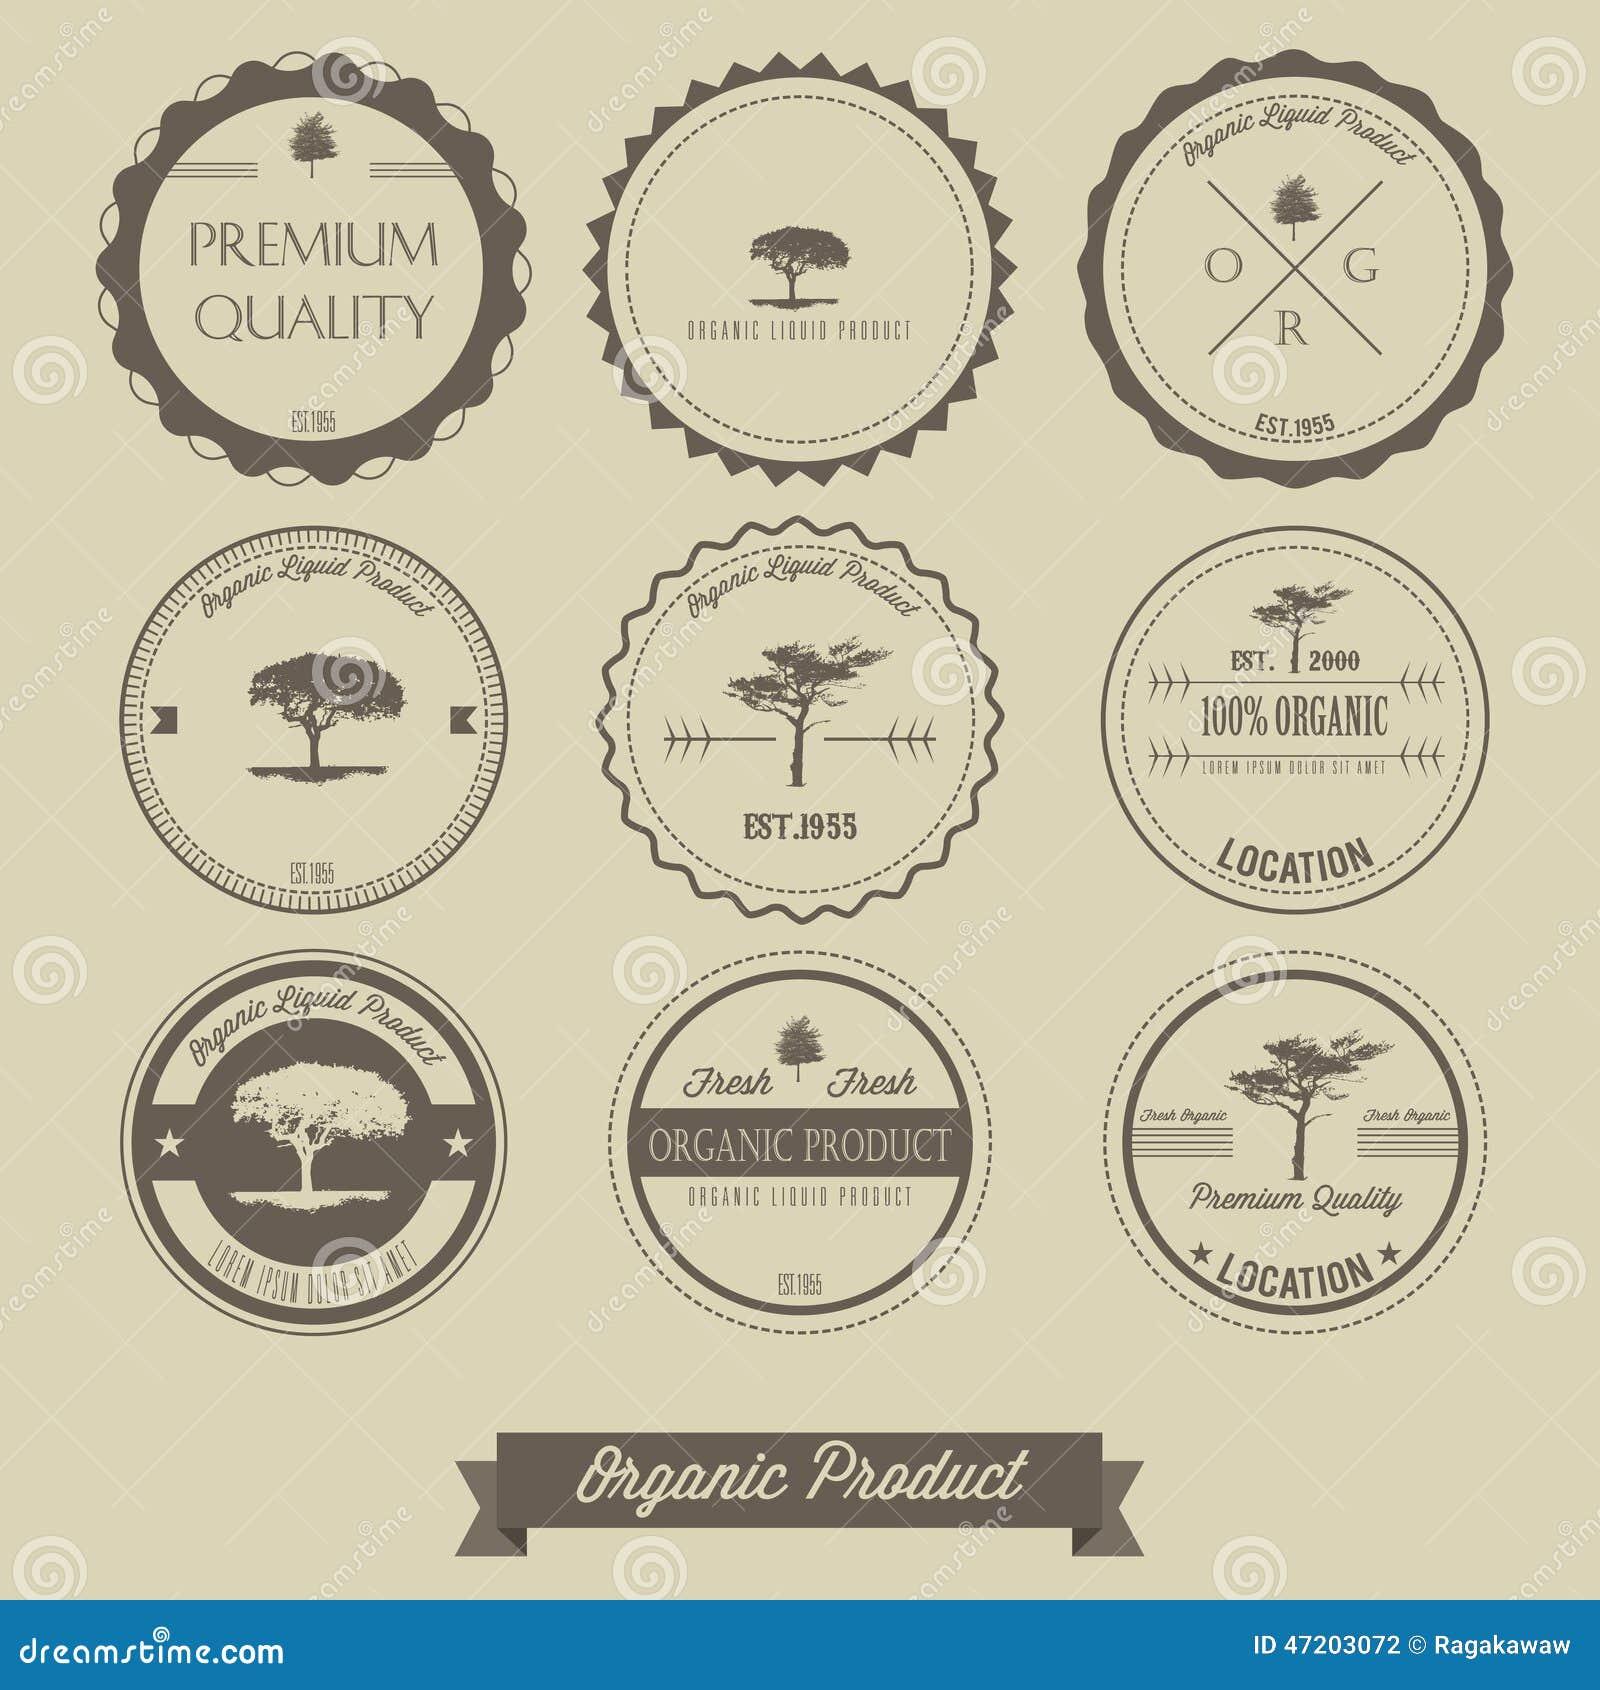 Premium quality organic product vintage label